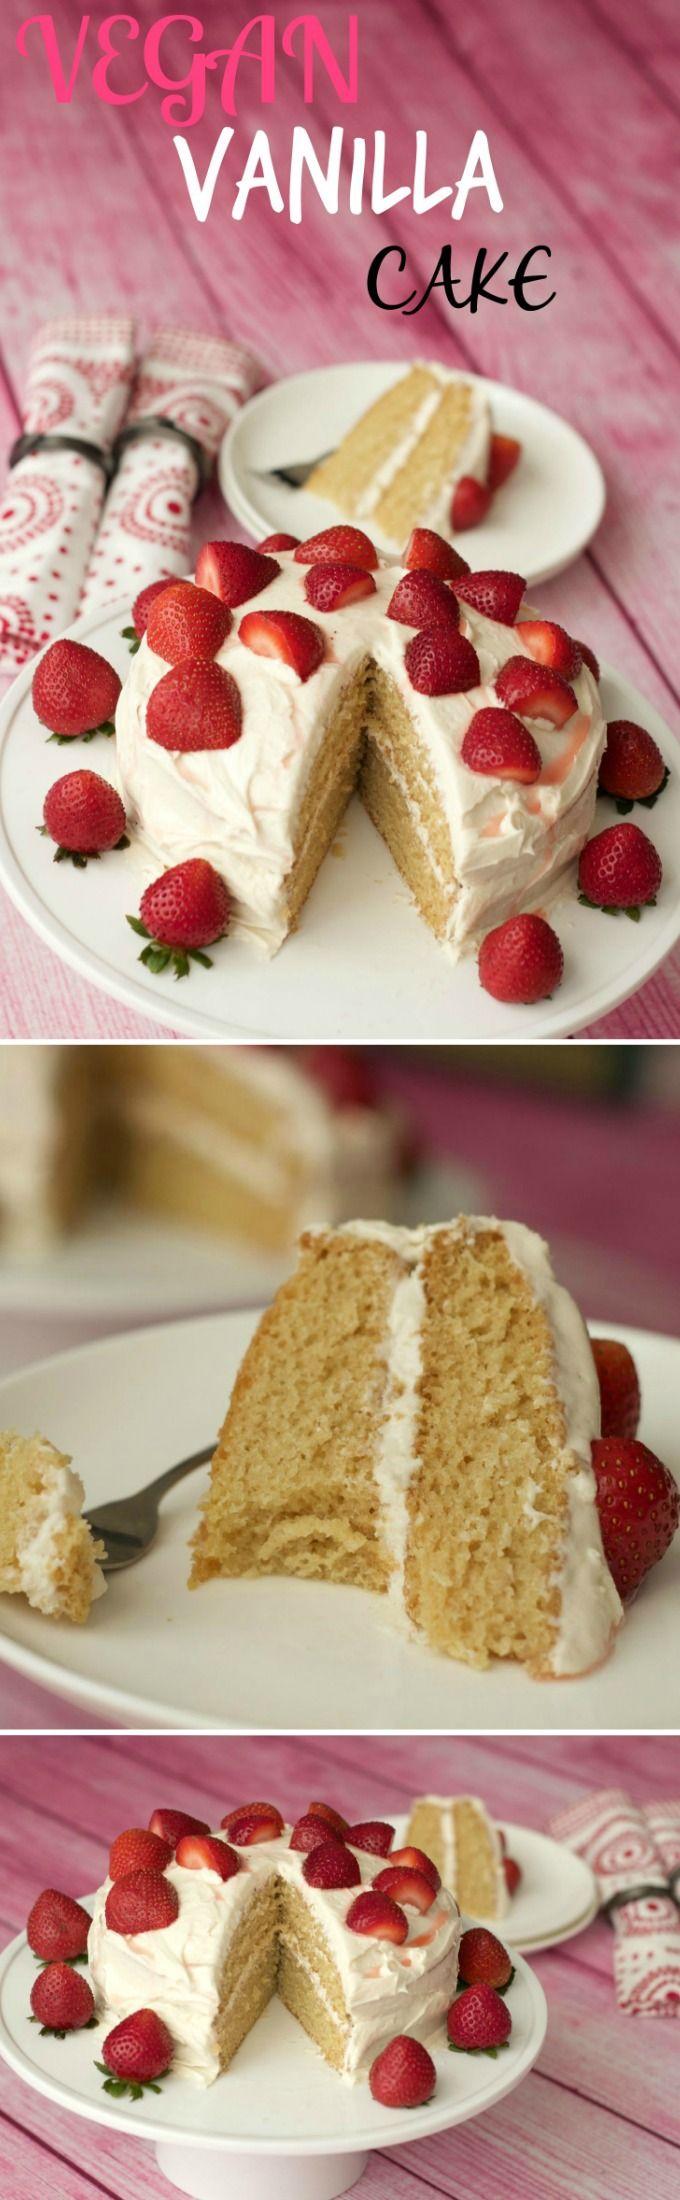 Vegan Vanilla Cake Light Fluffy And Dreamy Vegan Vegan Cakes Vegan Desserts Vegan Food Vegan Rec Vegan Vanilla Cake Vegan Cake Recipes Vegan Treats